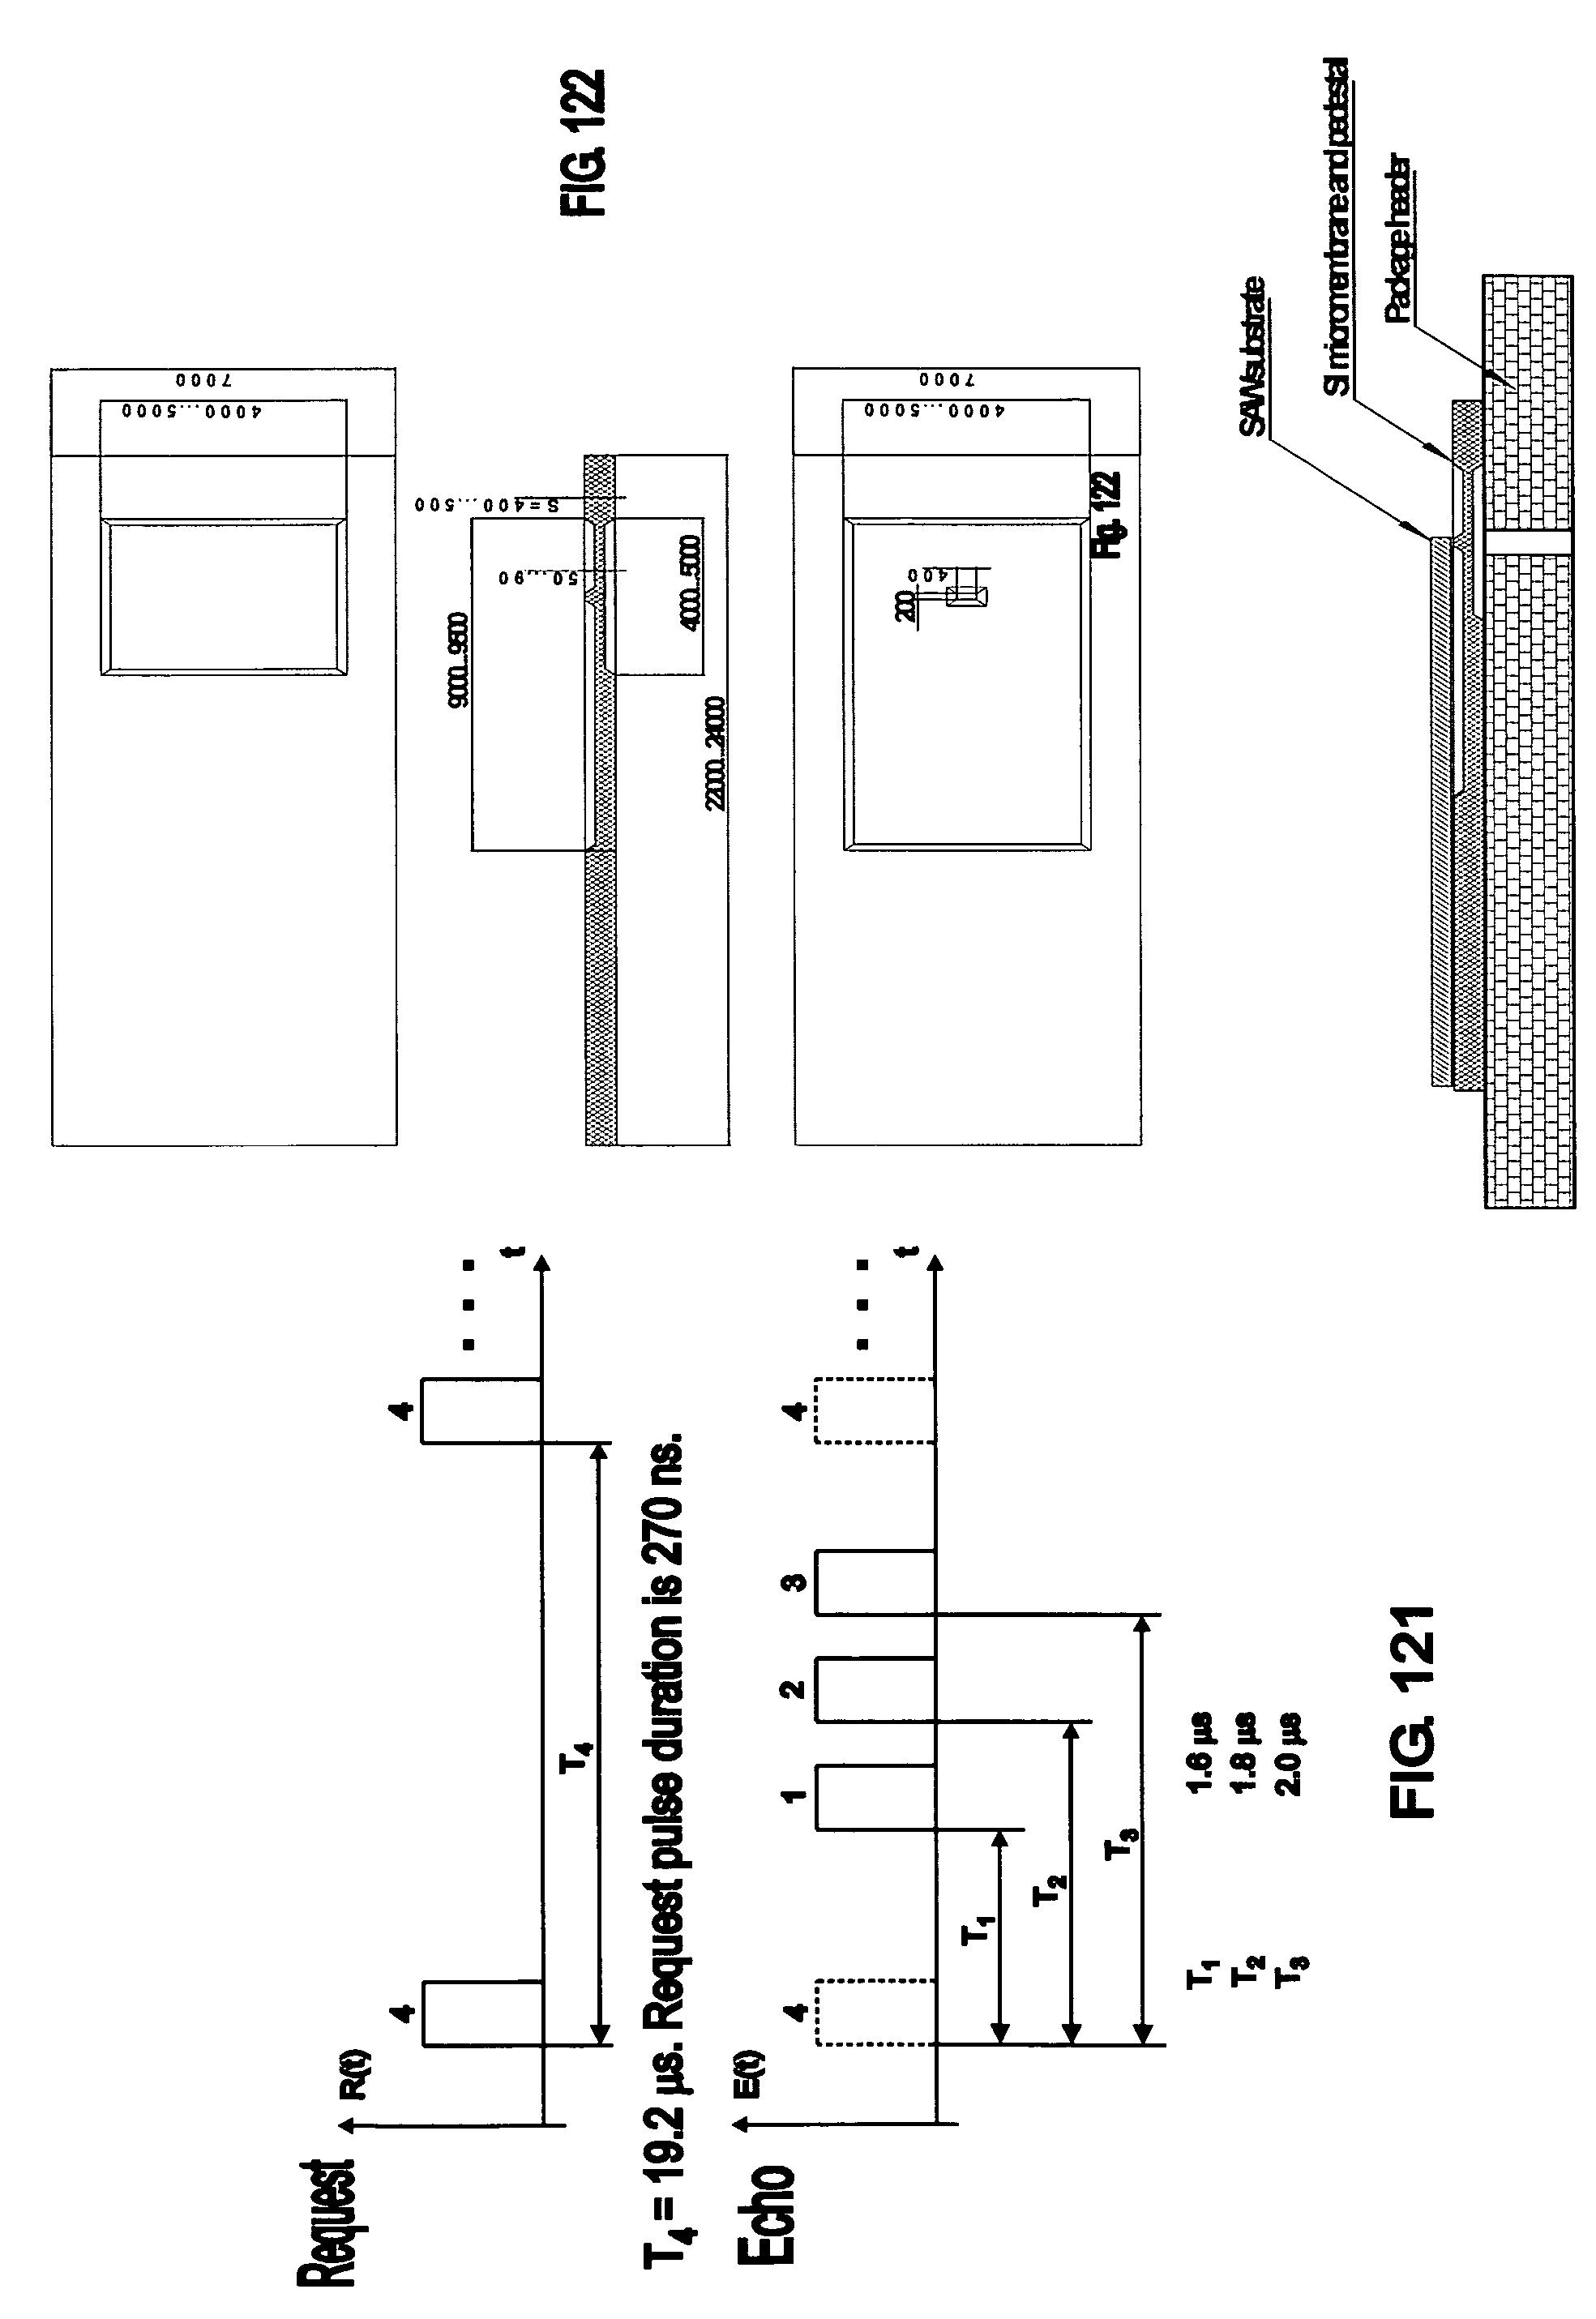 Patent Us 7421321 B2 Circuits Gt Remote Control Electric Hoist Circuit Diagram 1 0 Petitions